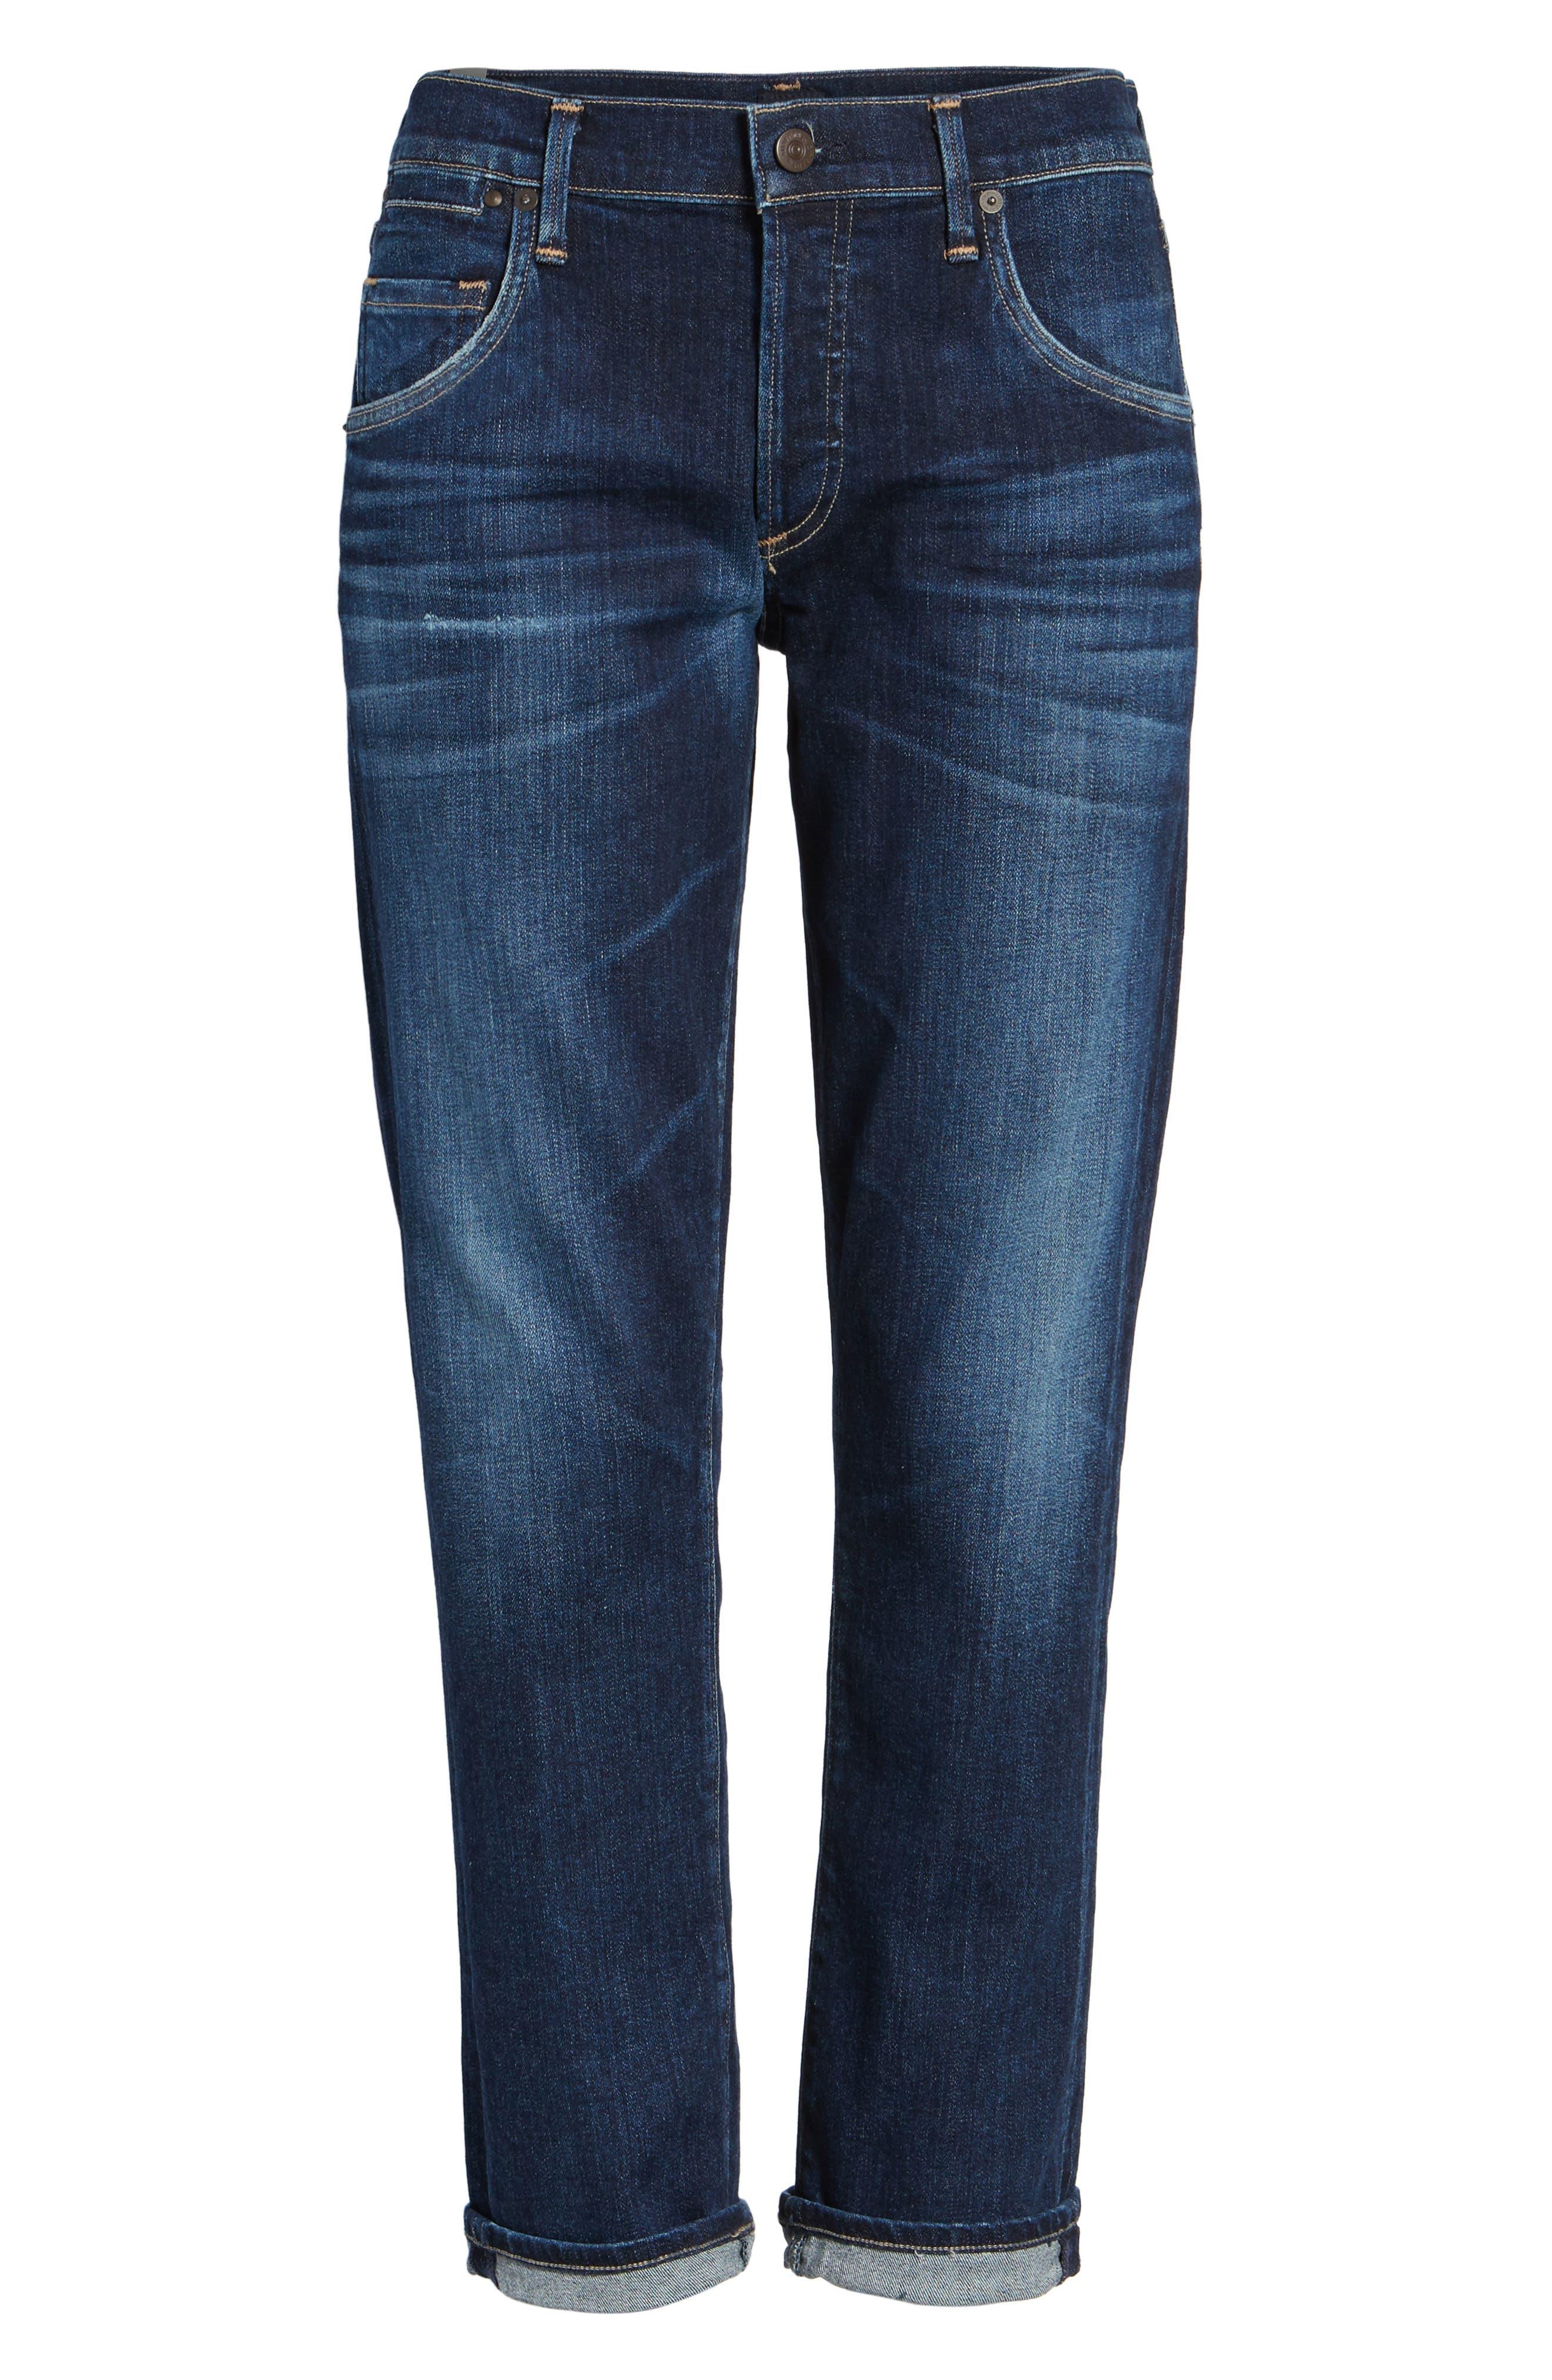 CITIZENS OF HUMANITY, Emerson Slim Boyfriend Jeans, Main thumbnail 1, color, BLUE RIDGE